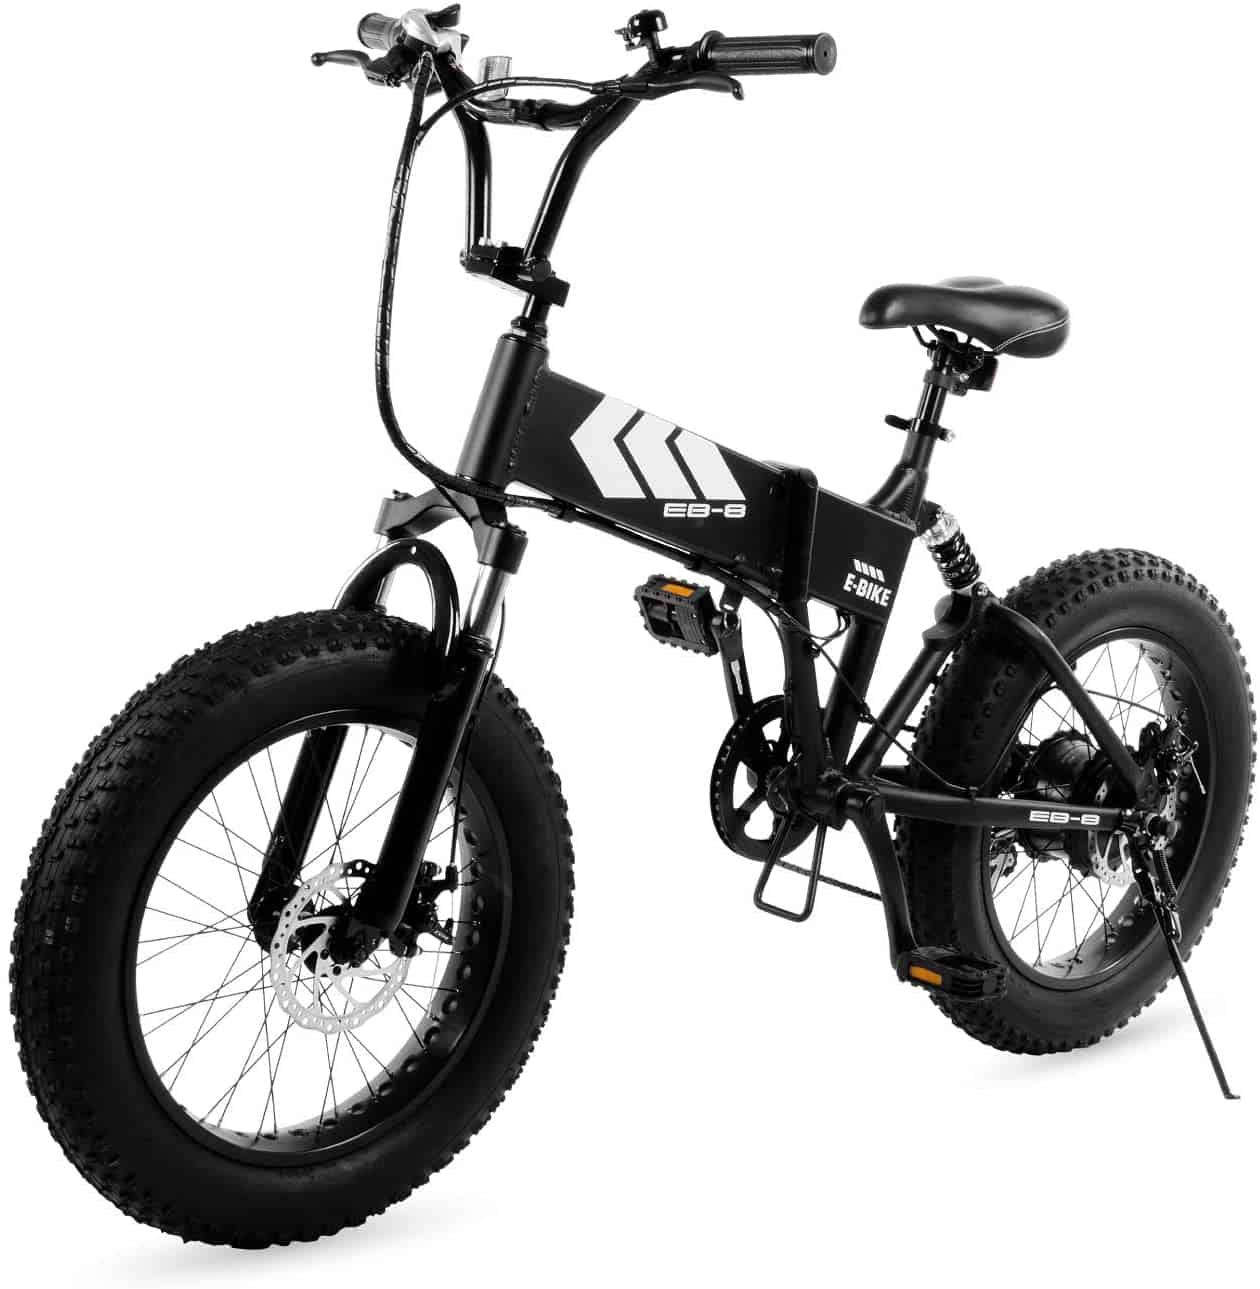 Swagtron Electric Bike – Fat Tire EB-8 Outlaw